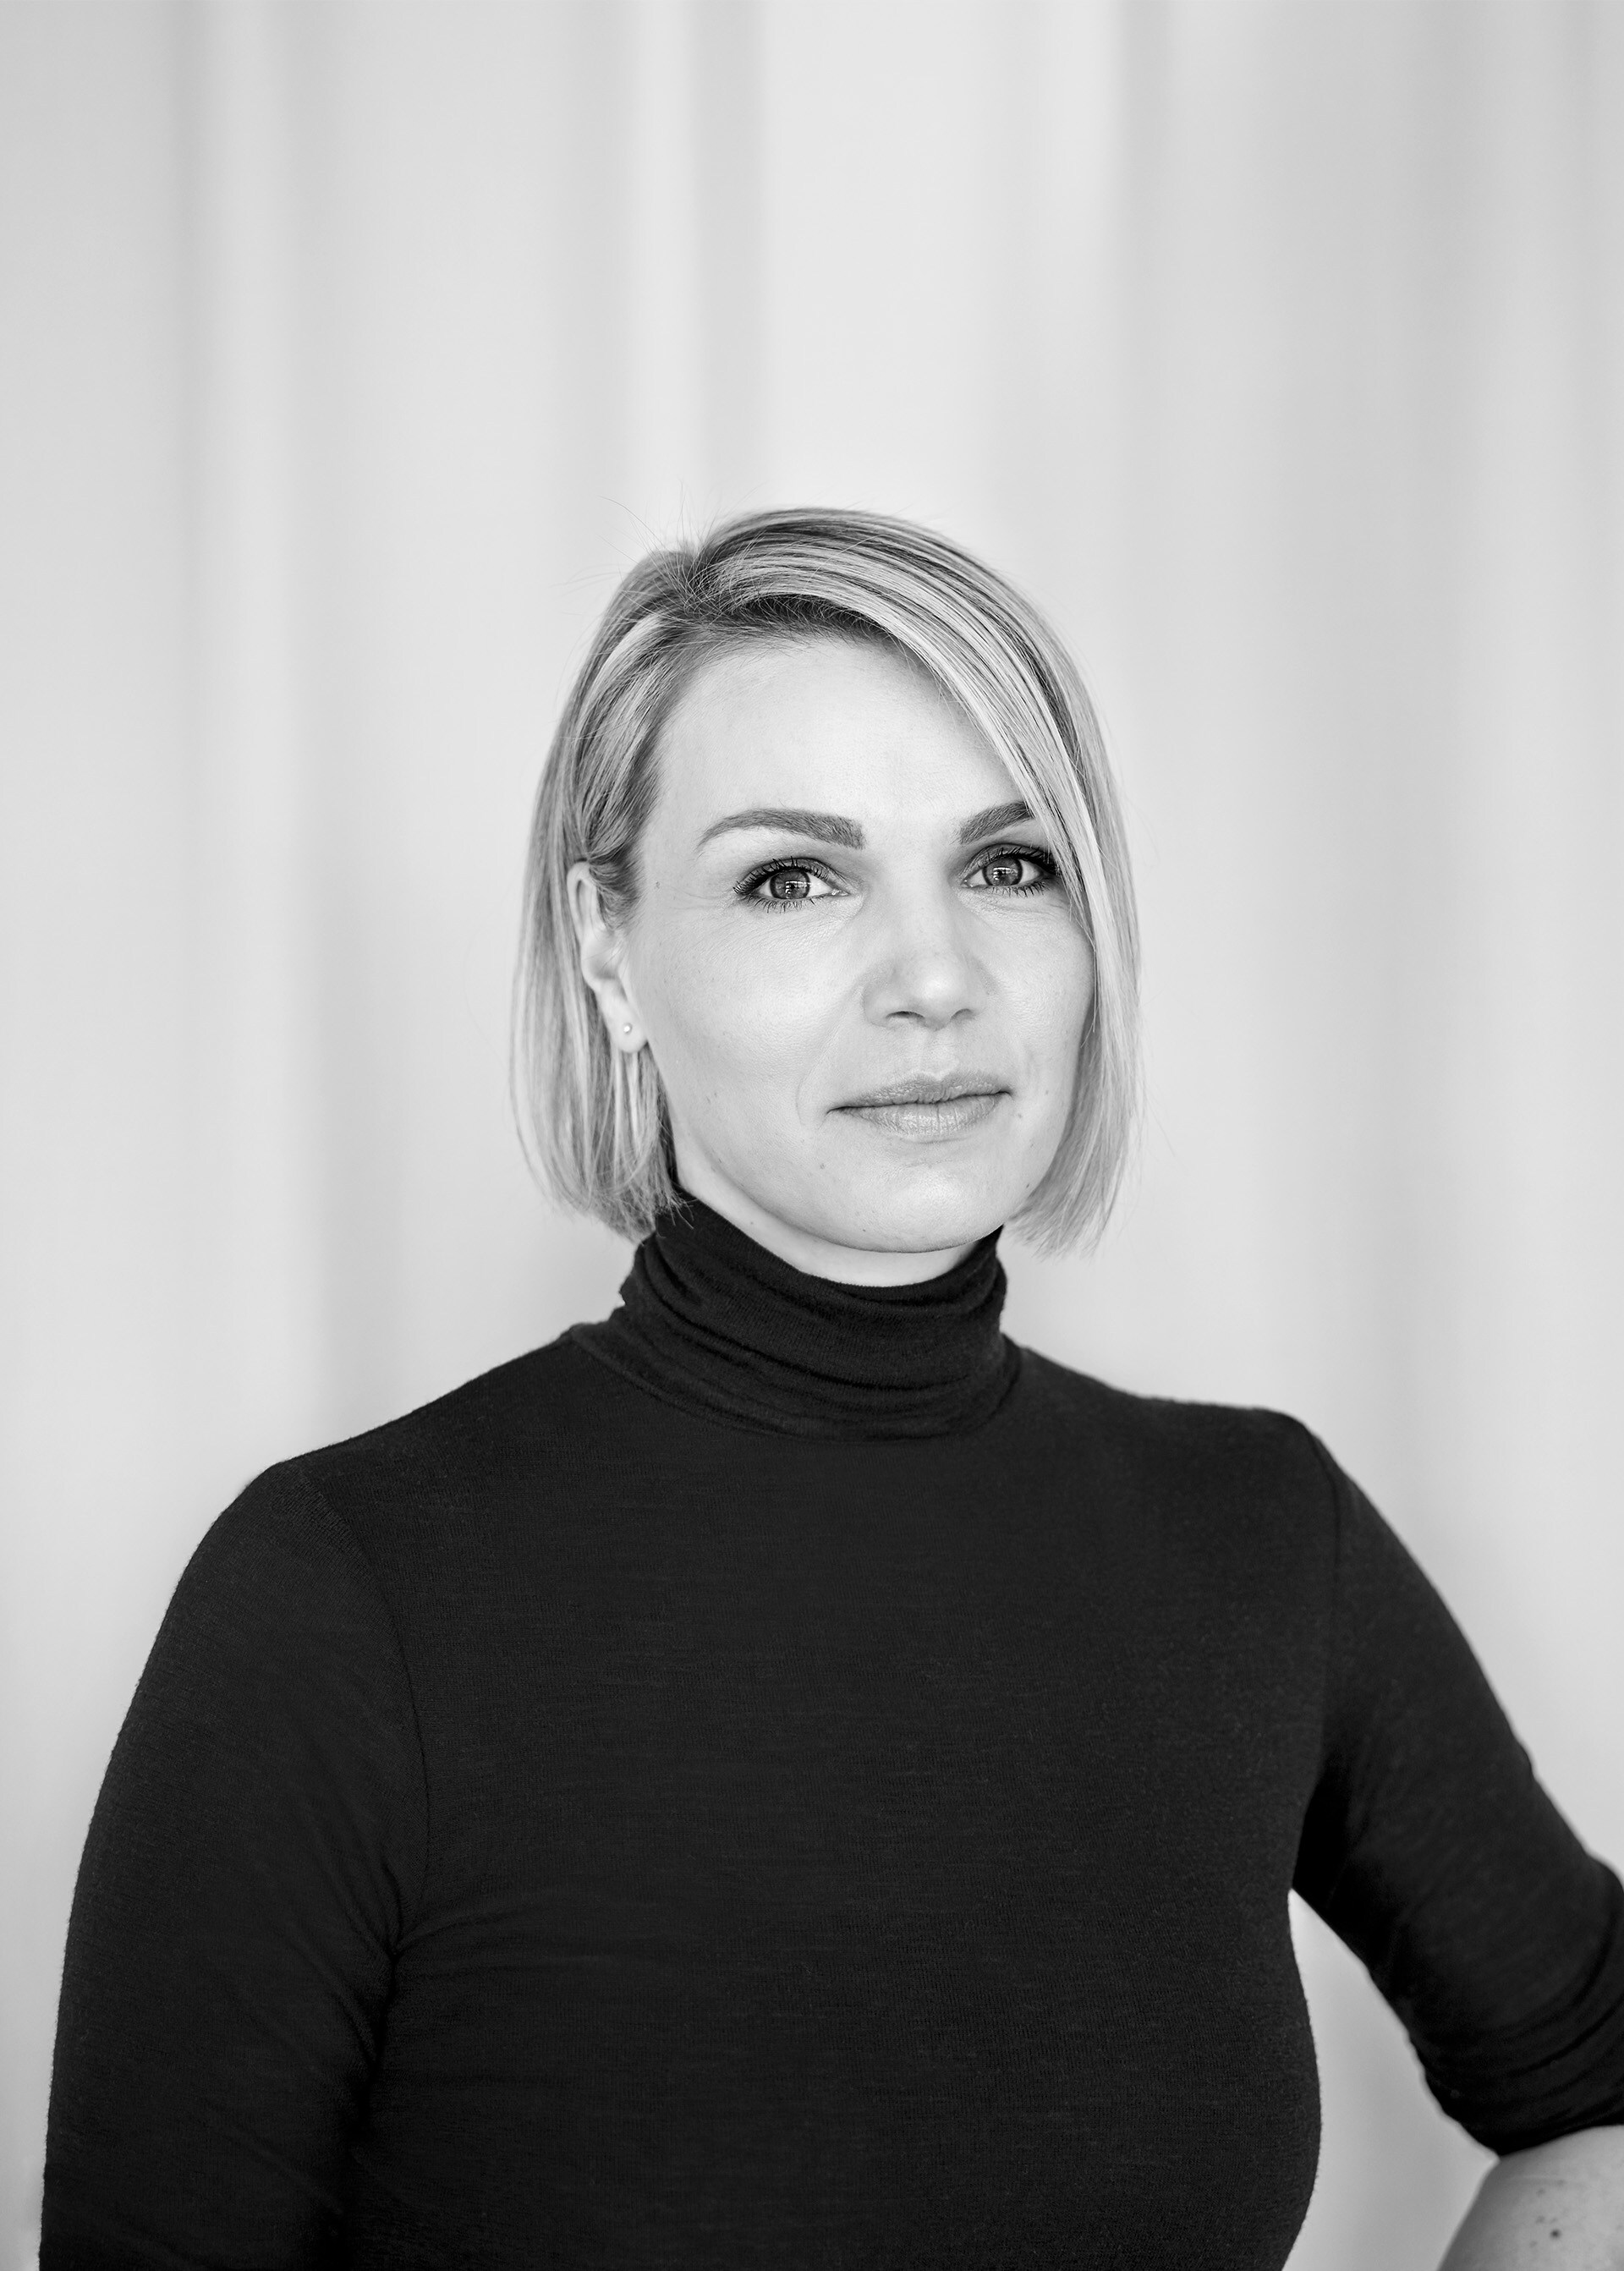 Industrijska oblikovalka Christina Wittmann